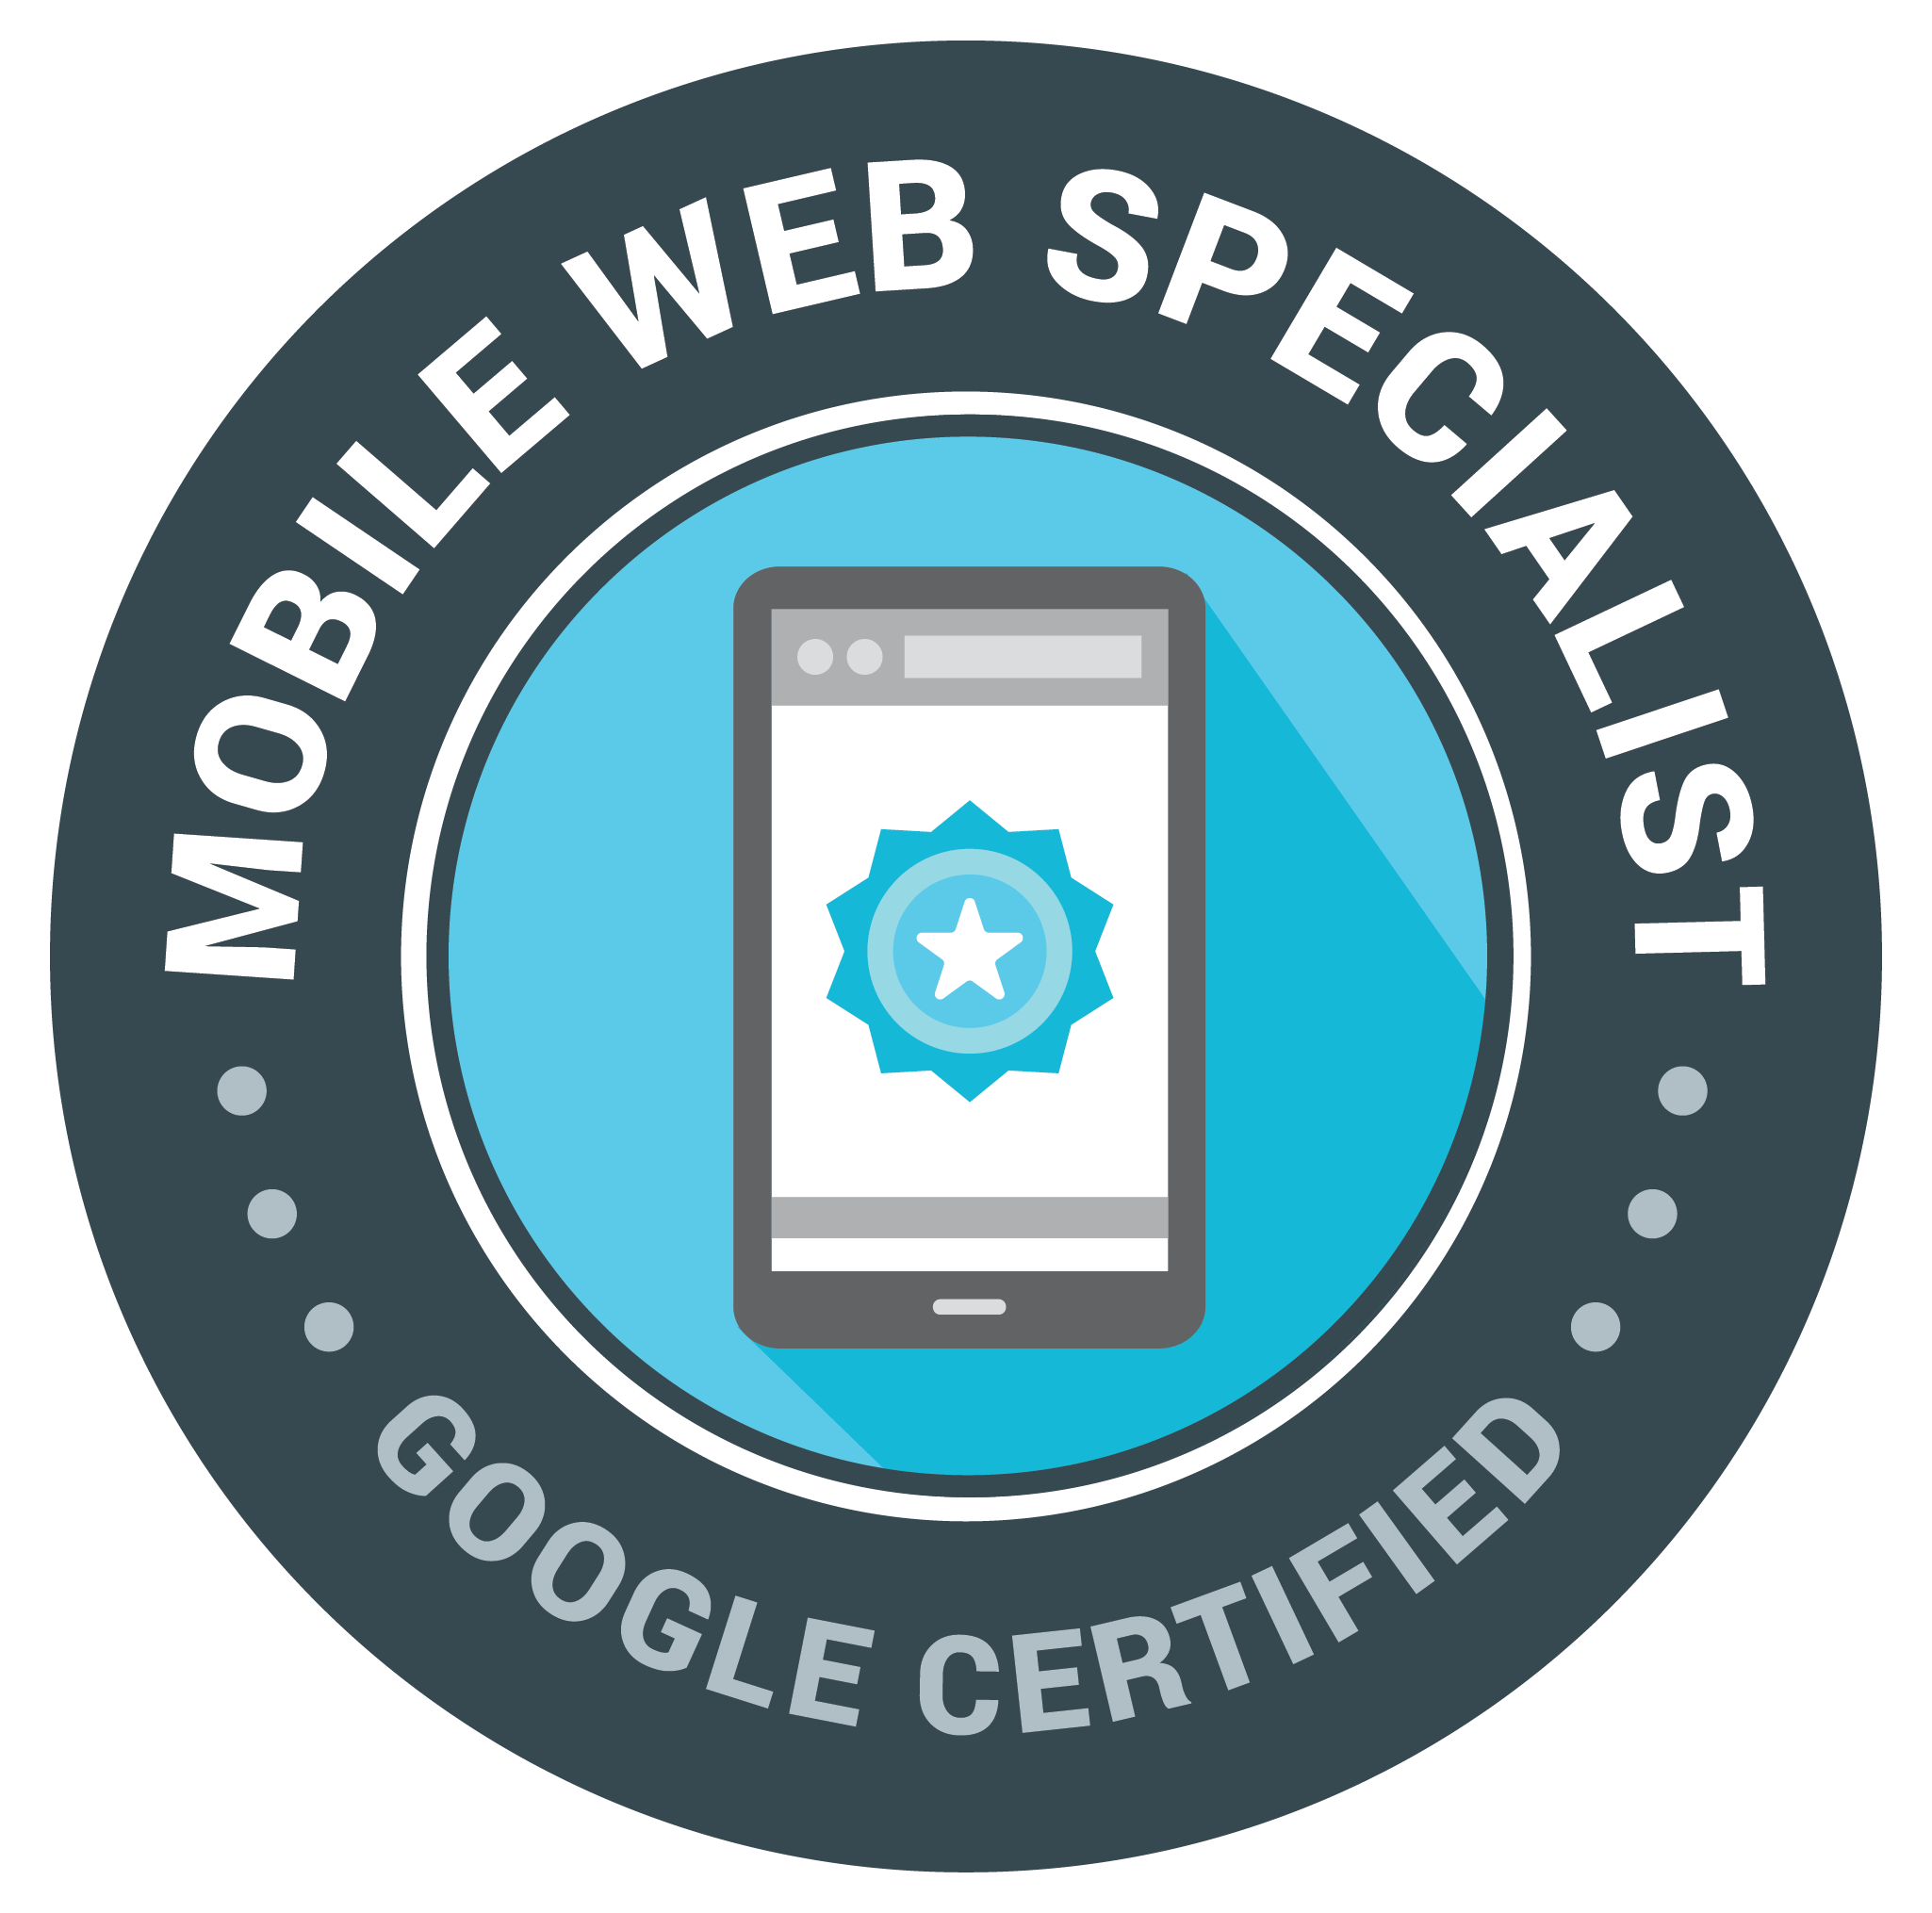 Mobile Web Specialist 認定資格 バッジ